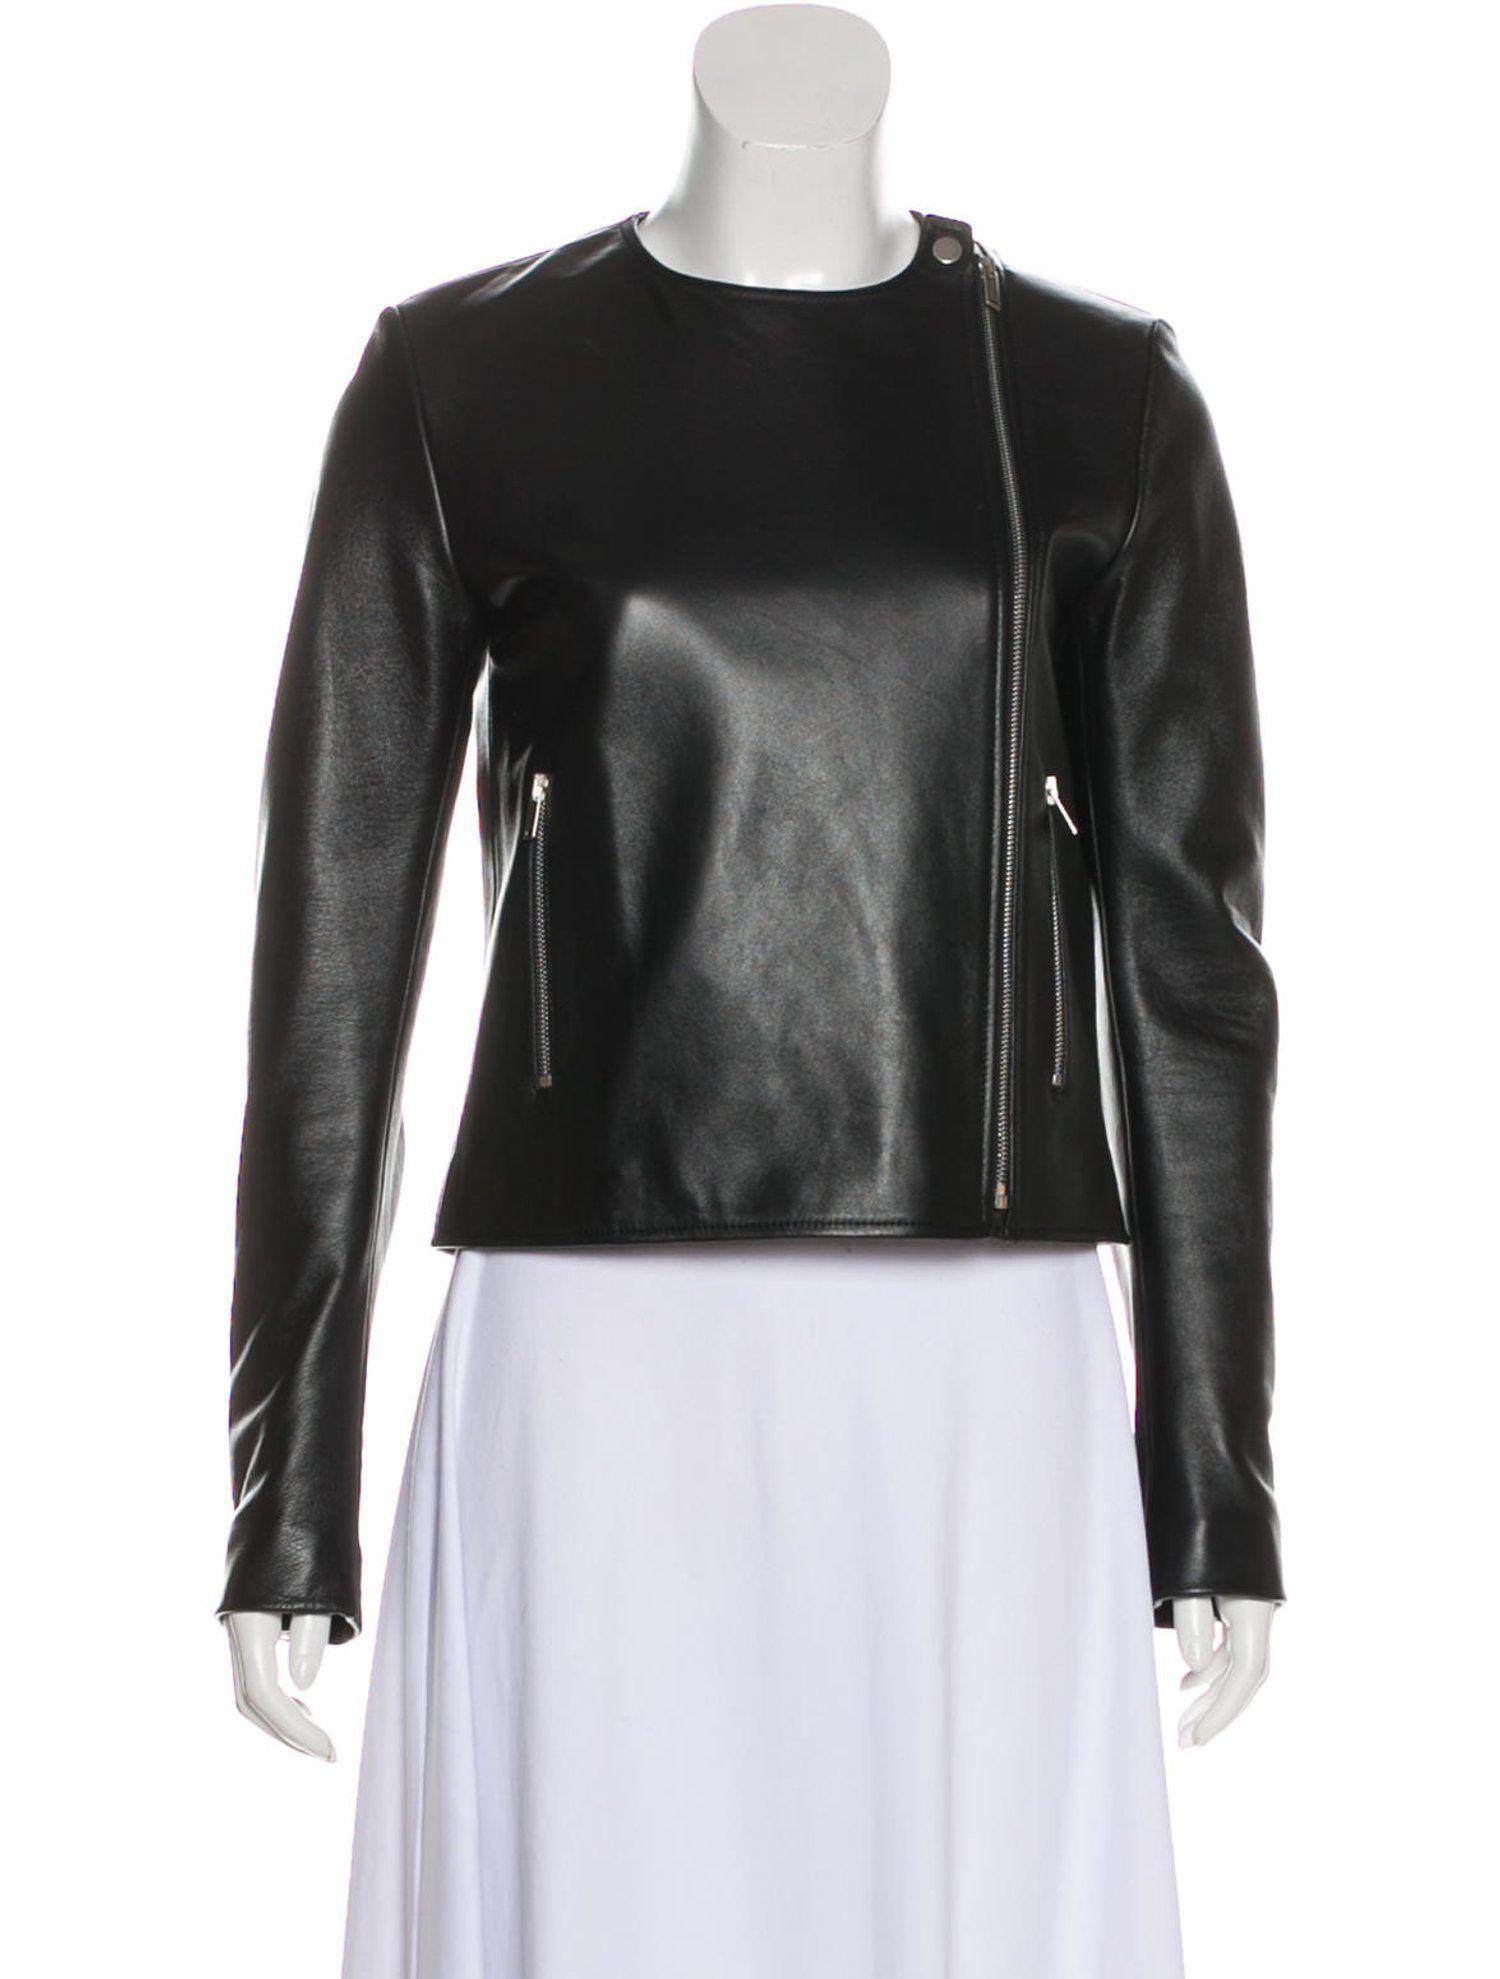 Celine Collarless Leather Jacket Sponsored Collarless Celine Jacket Collarless Leather Jacket Jackets Collarless [ 1979 x 1500 Pixel ]